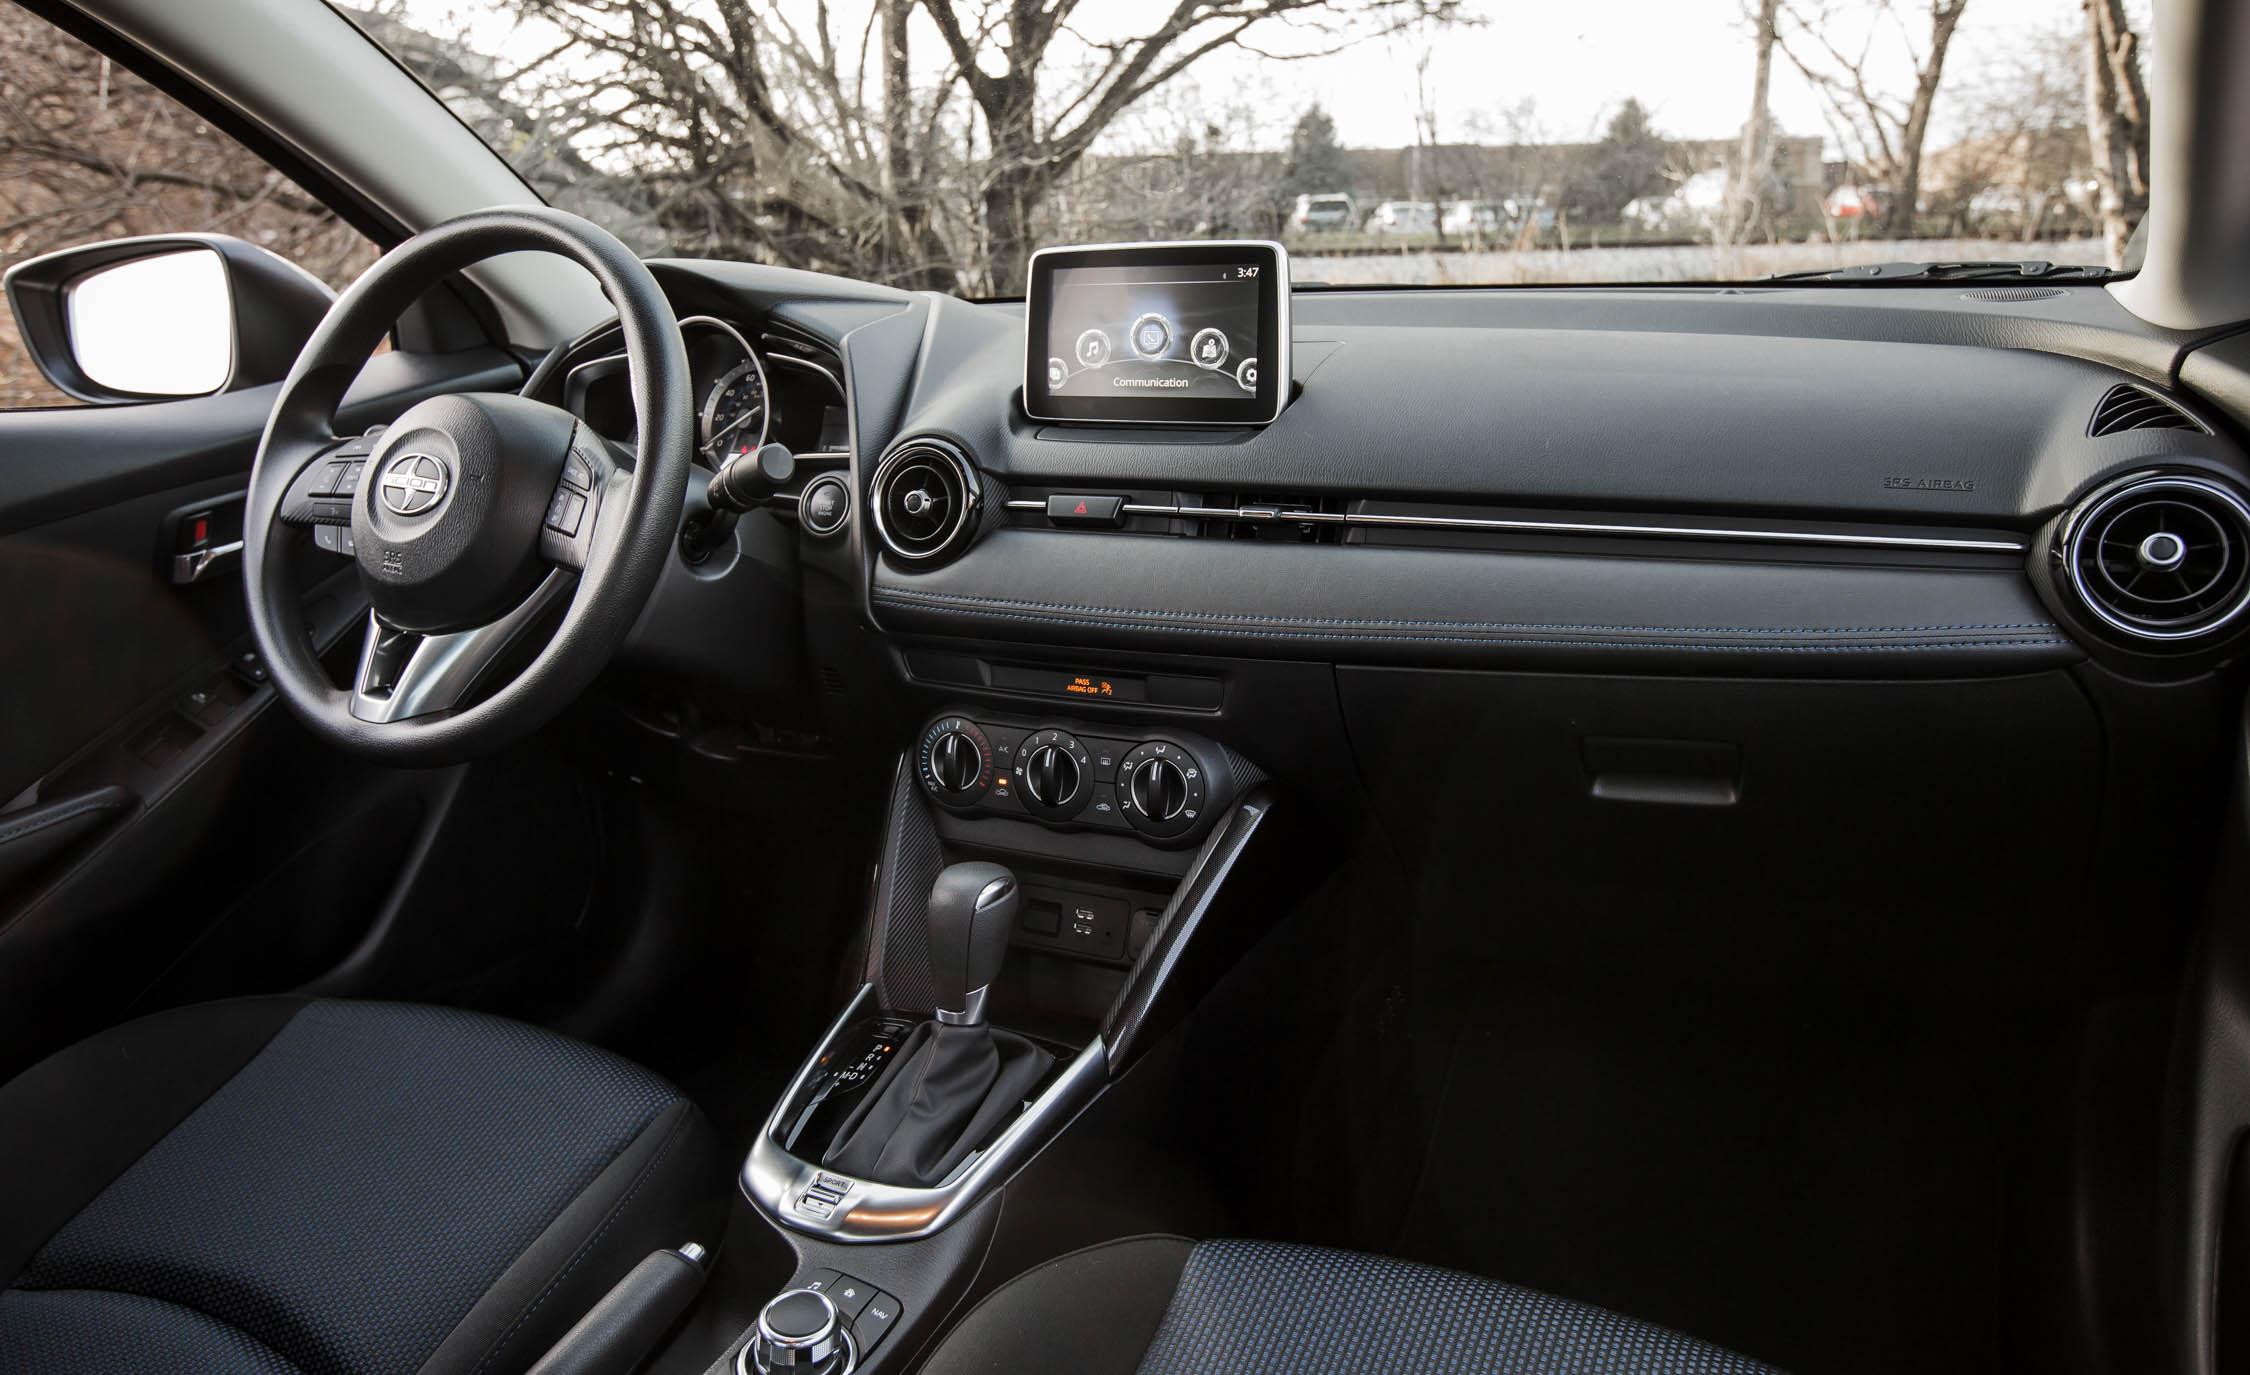 2016 Scion iA Interior Front